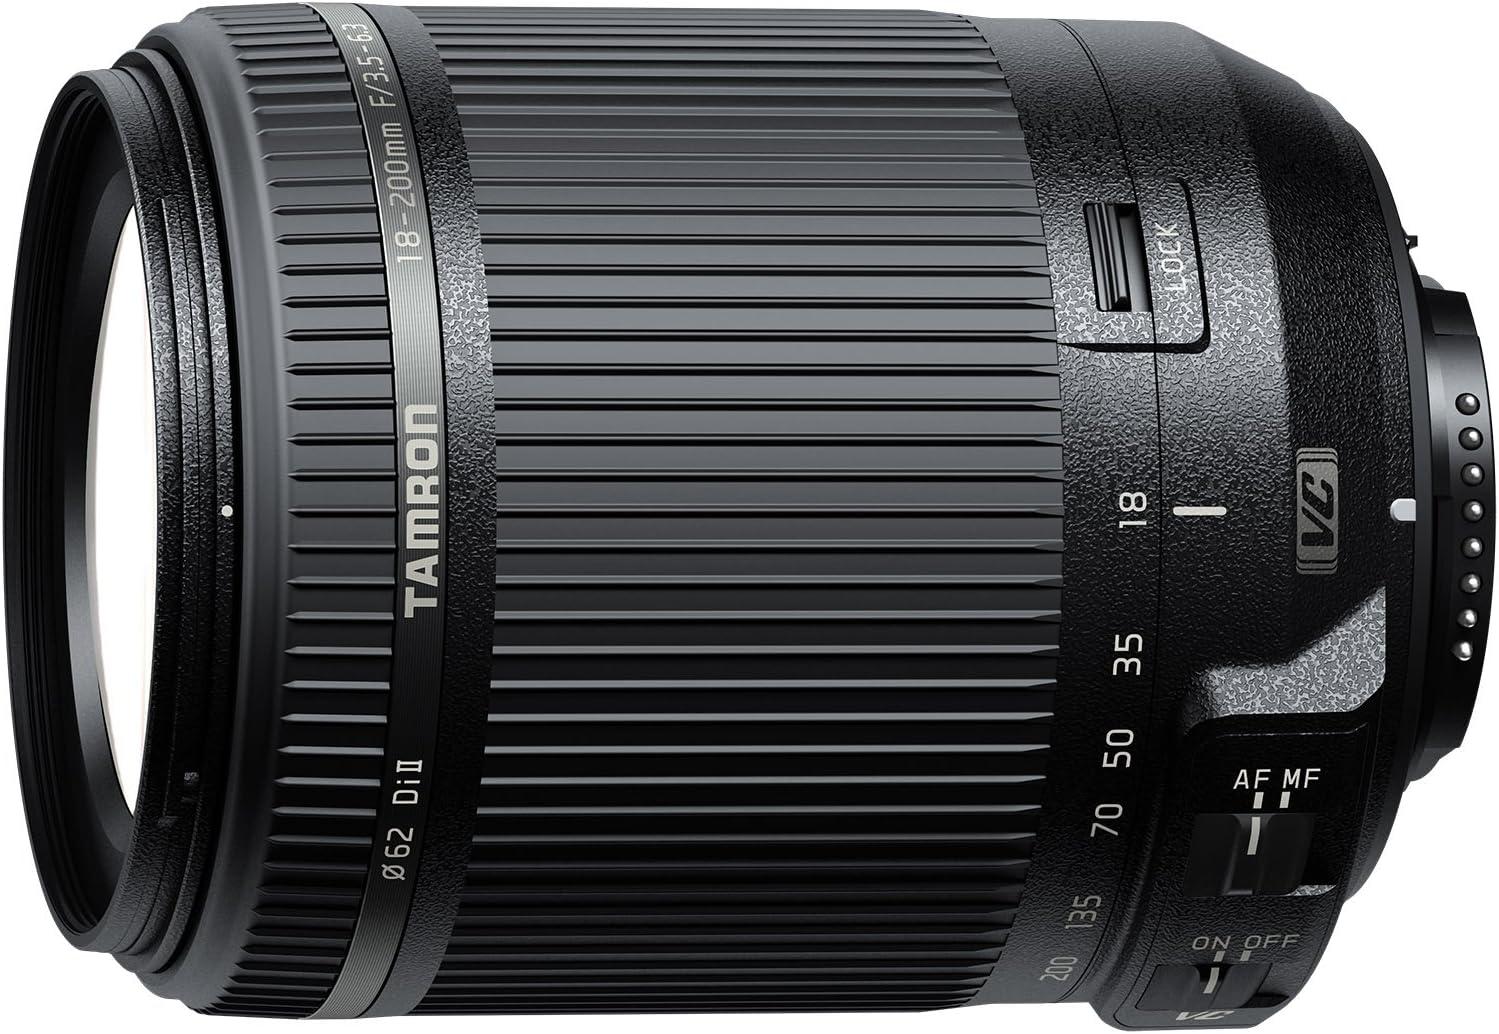 Best Budget Nikon Lenses (Under $200)